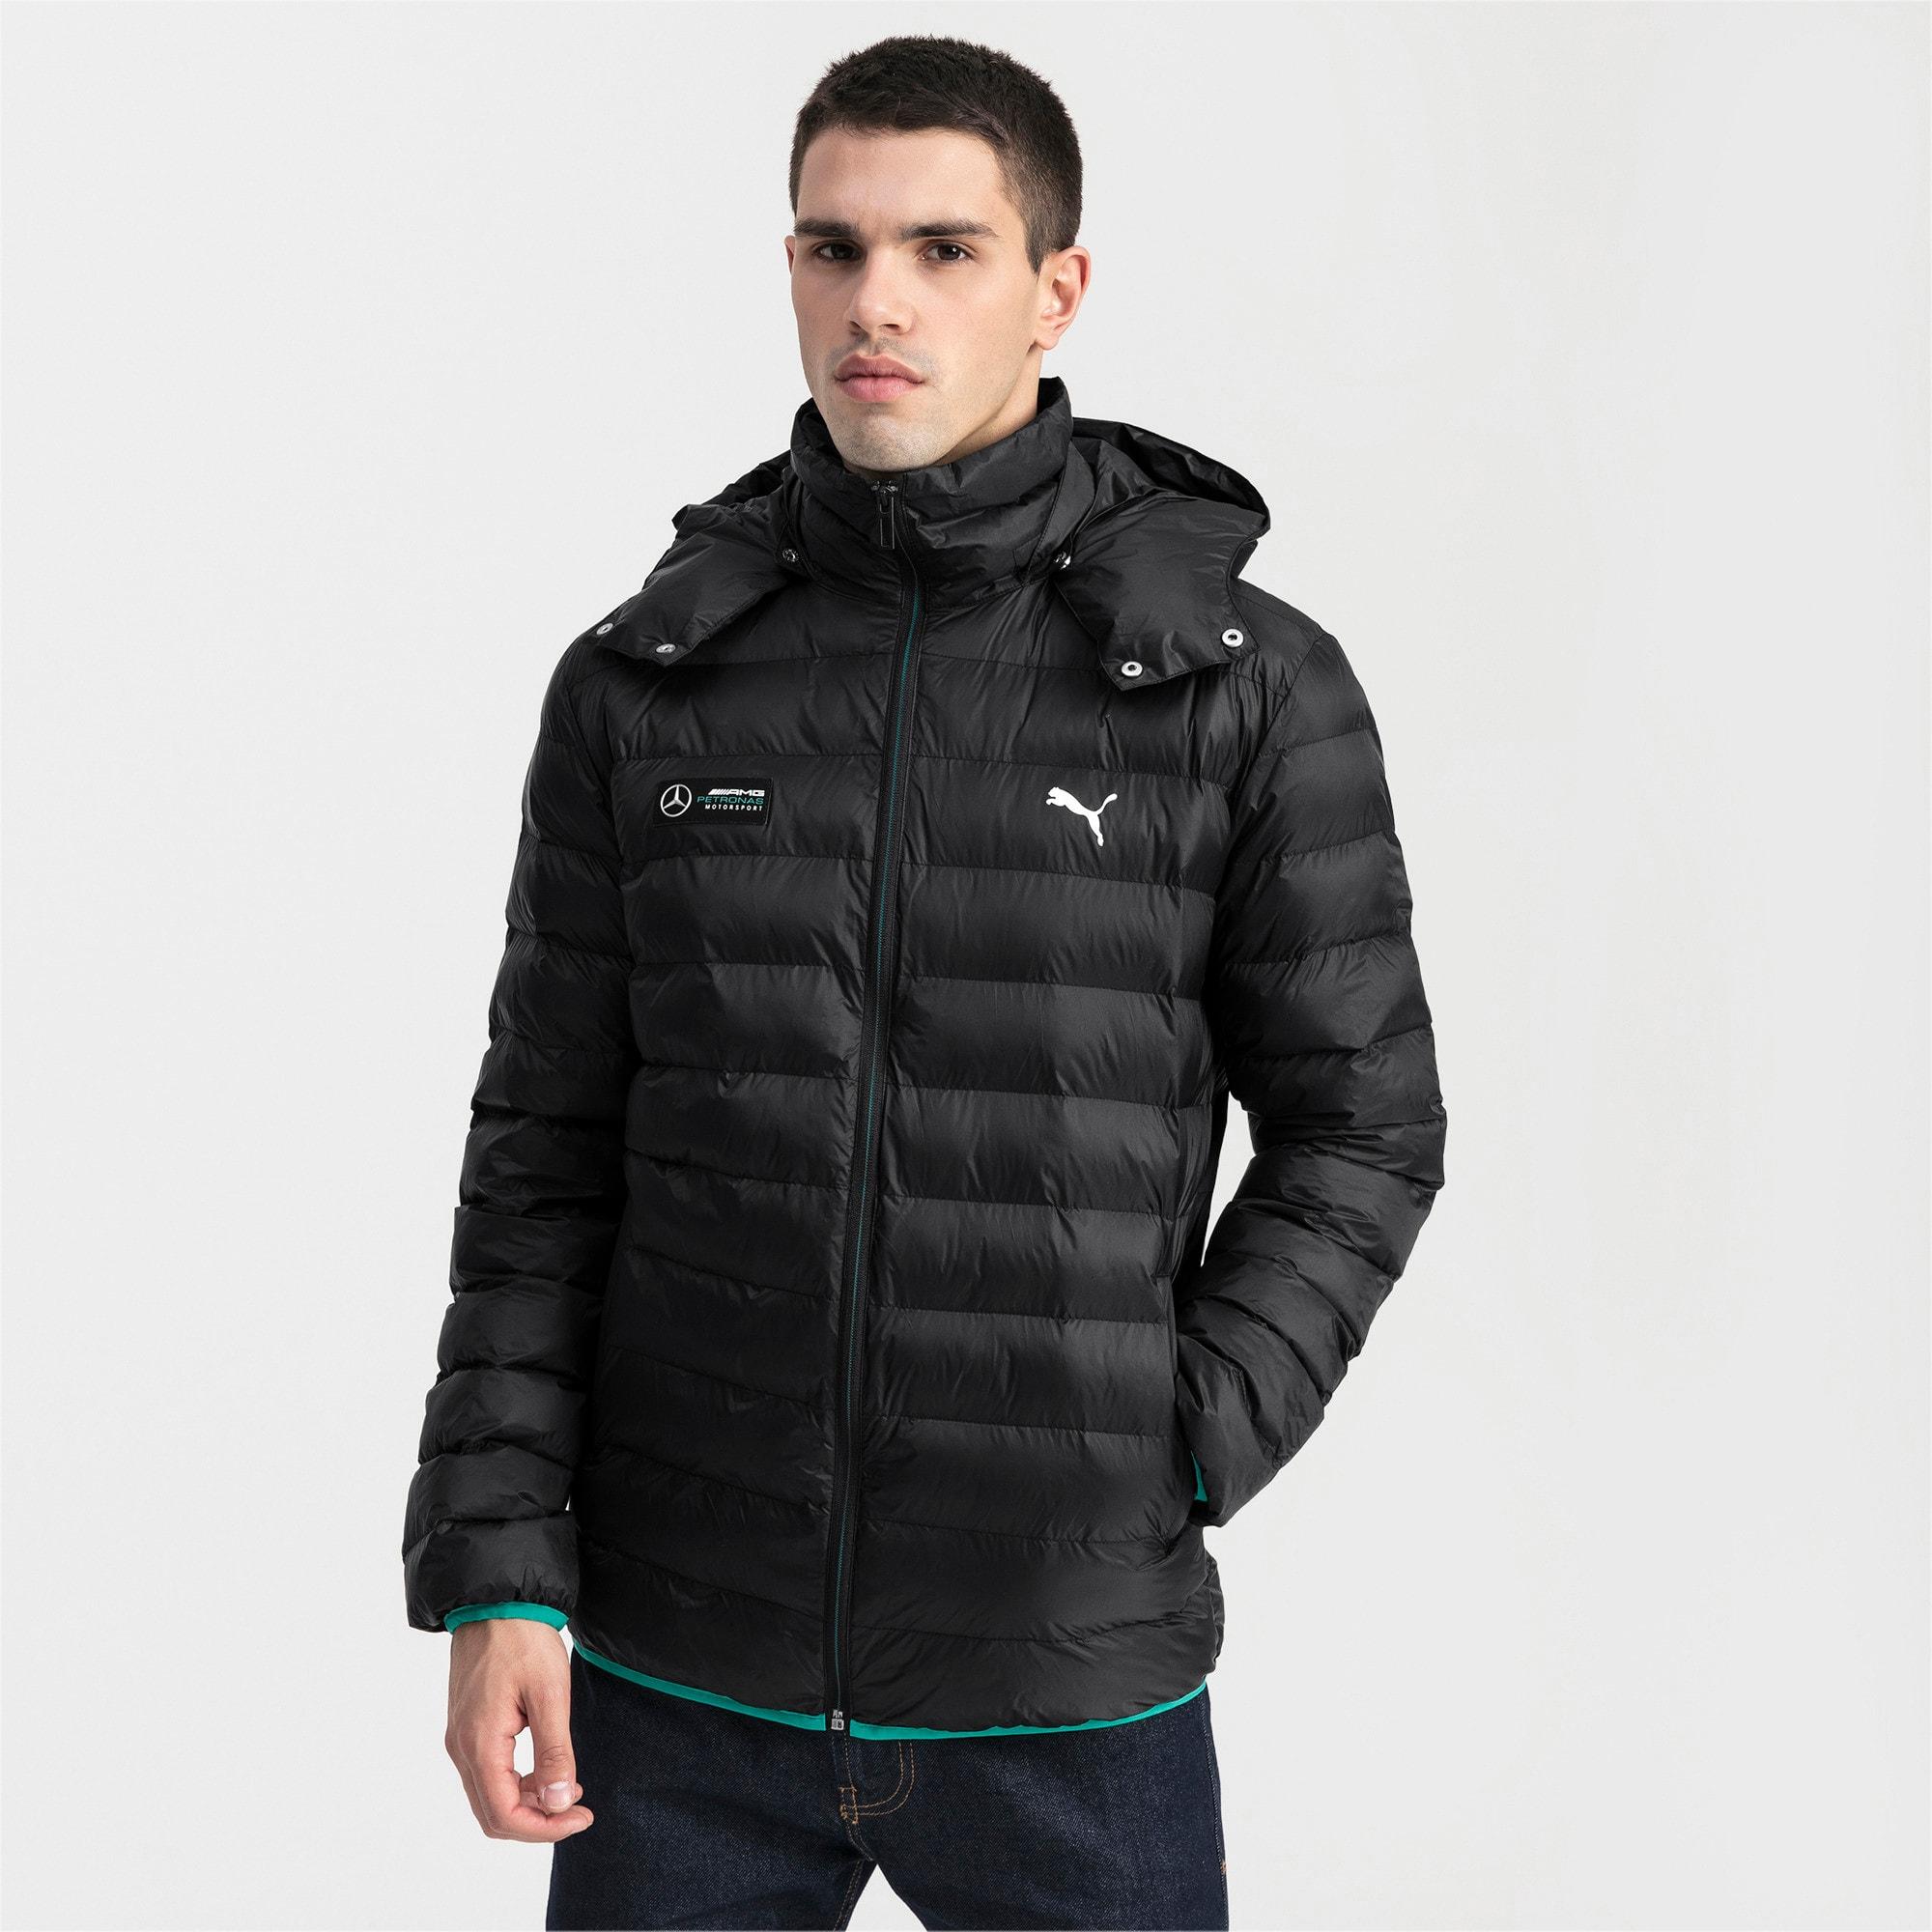 Thumbnail 1 of Mercedes AMG Petronas Eco PackLIite Men's Jacket, Puma Black, medium